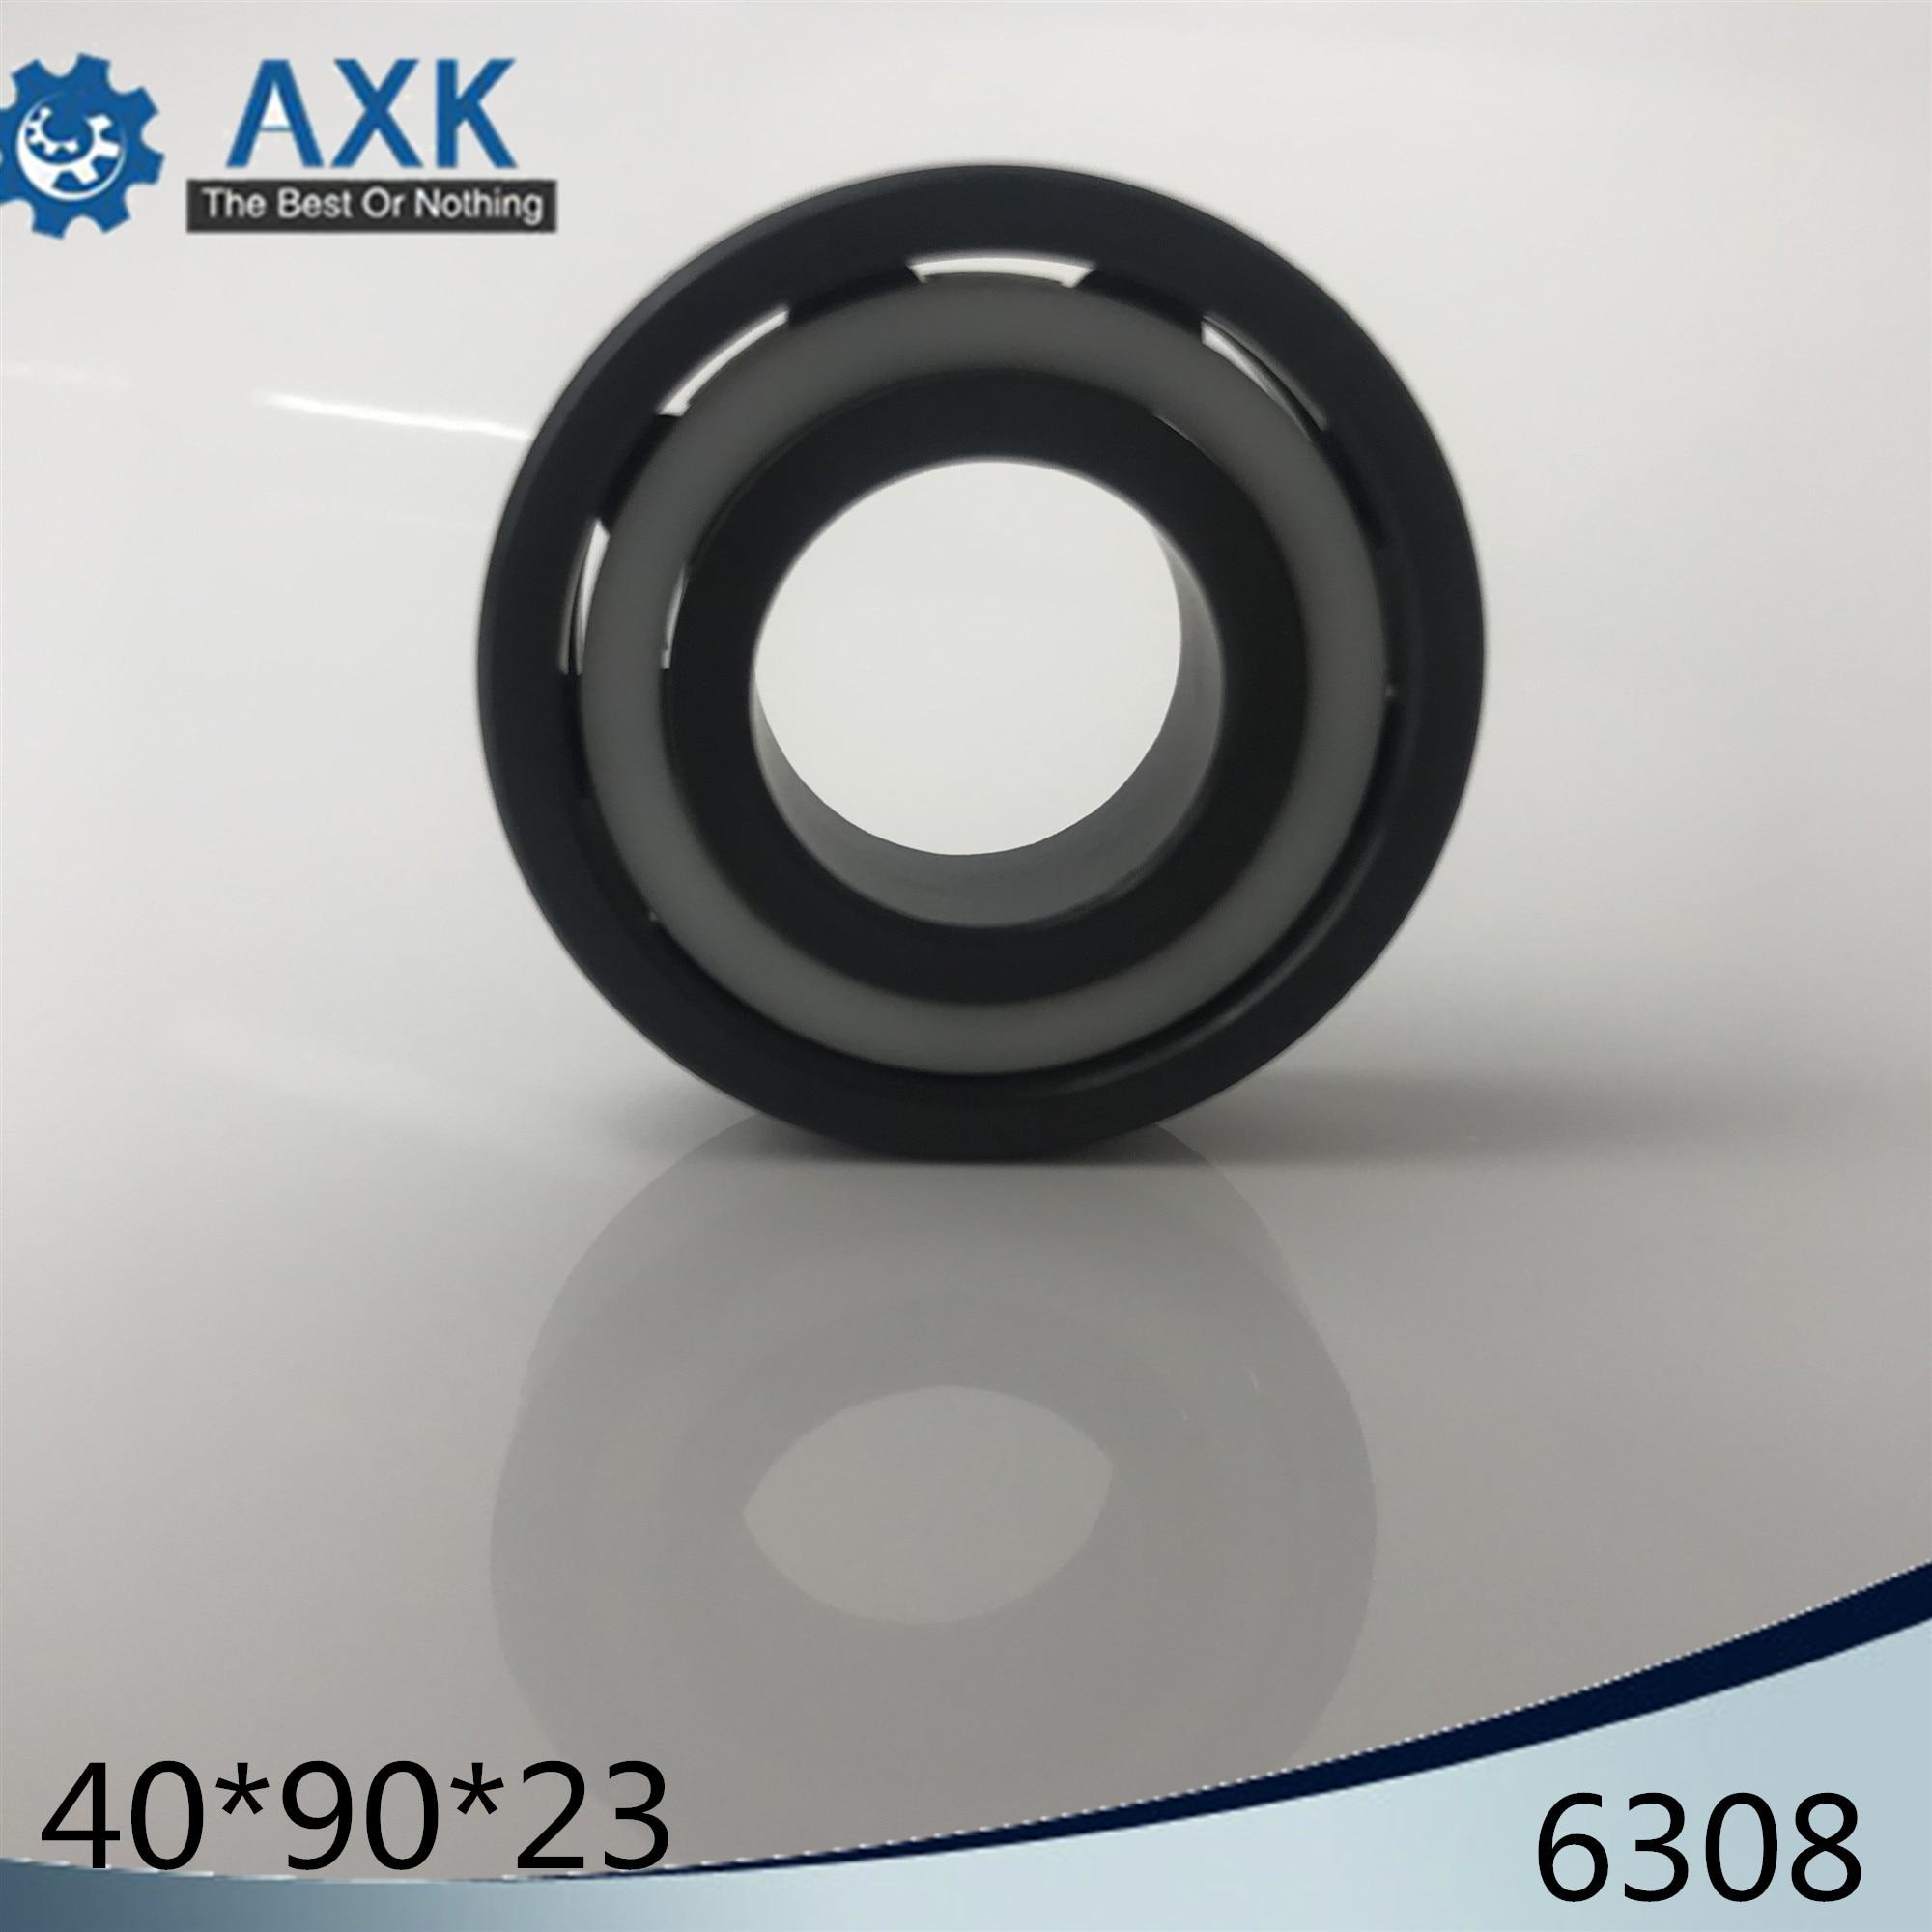 6308 Full Ceramic Bearing ( 1 PC ) 40*90*23 mm Si3N4 Material 6308CE All Silicon Nitride Ceramic Ball Bearings6308 Full Ceramic Bearing ( 1 PC ) 40*90*23 mm Si3N4 Material 6308CE All Silicon Nitride Ceramic Ball Bearings